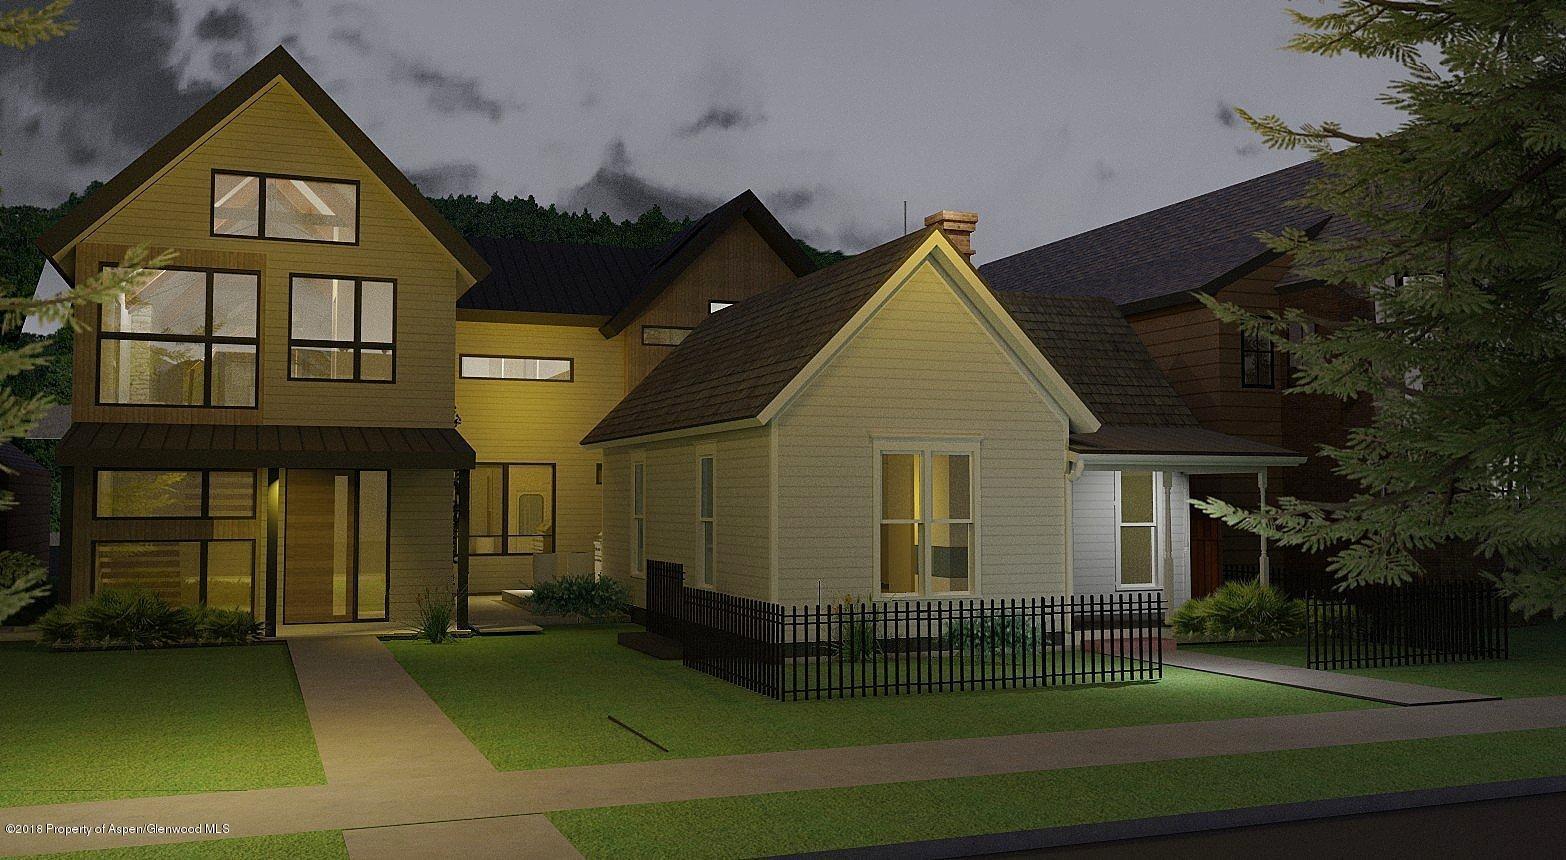 209 E Bleeker Street - West End, Colorado